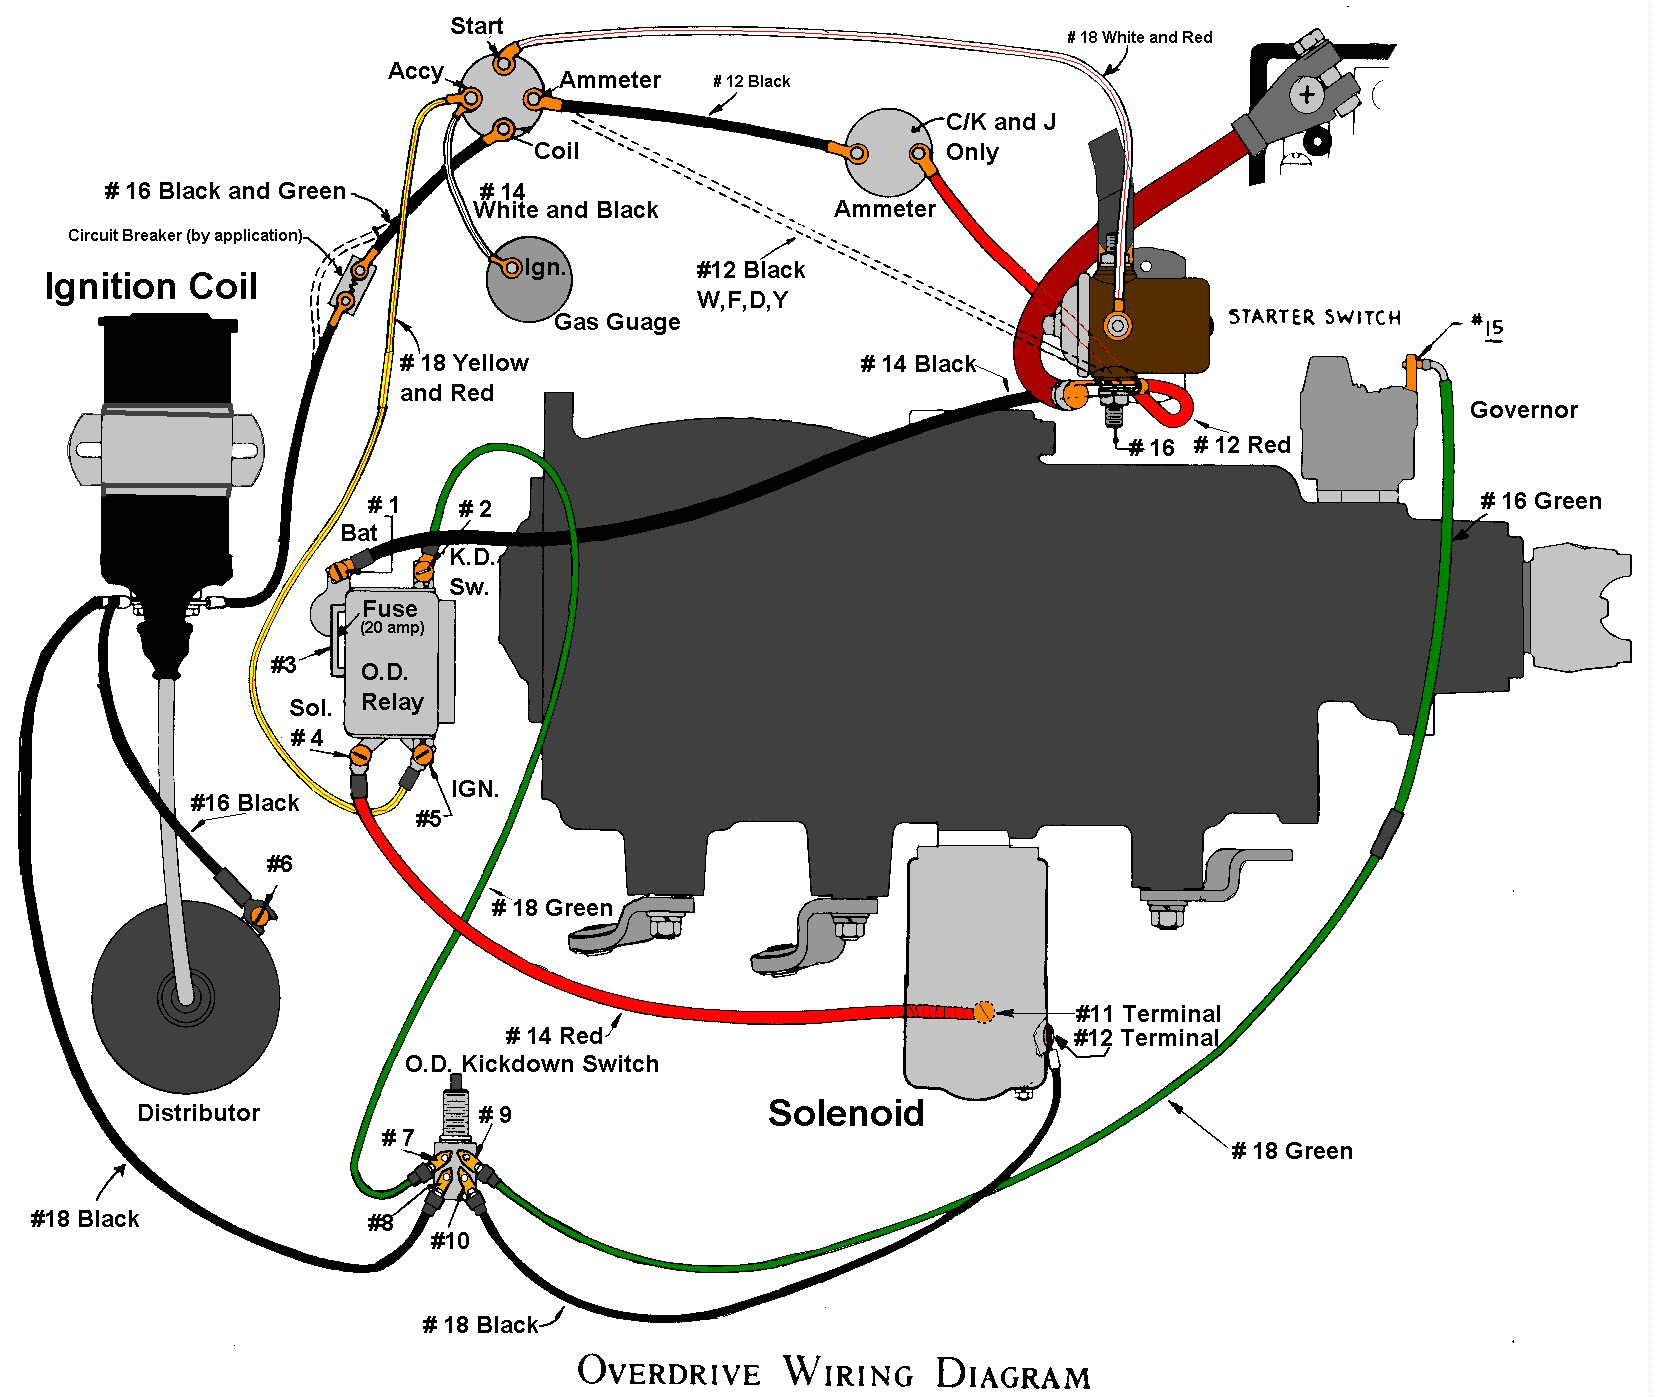 4r70w diagram beautiful 4r70w valve body diagram electrical wiring